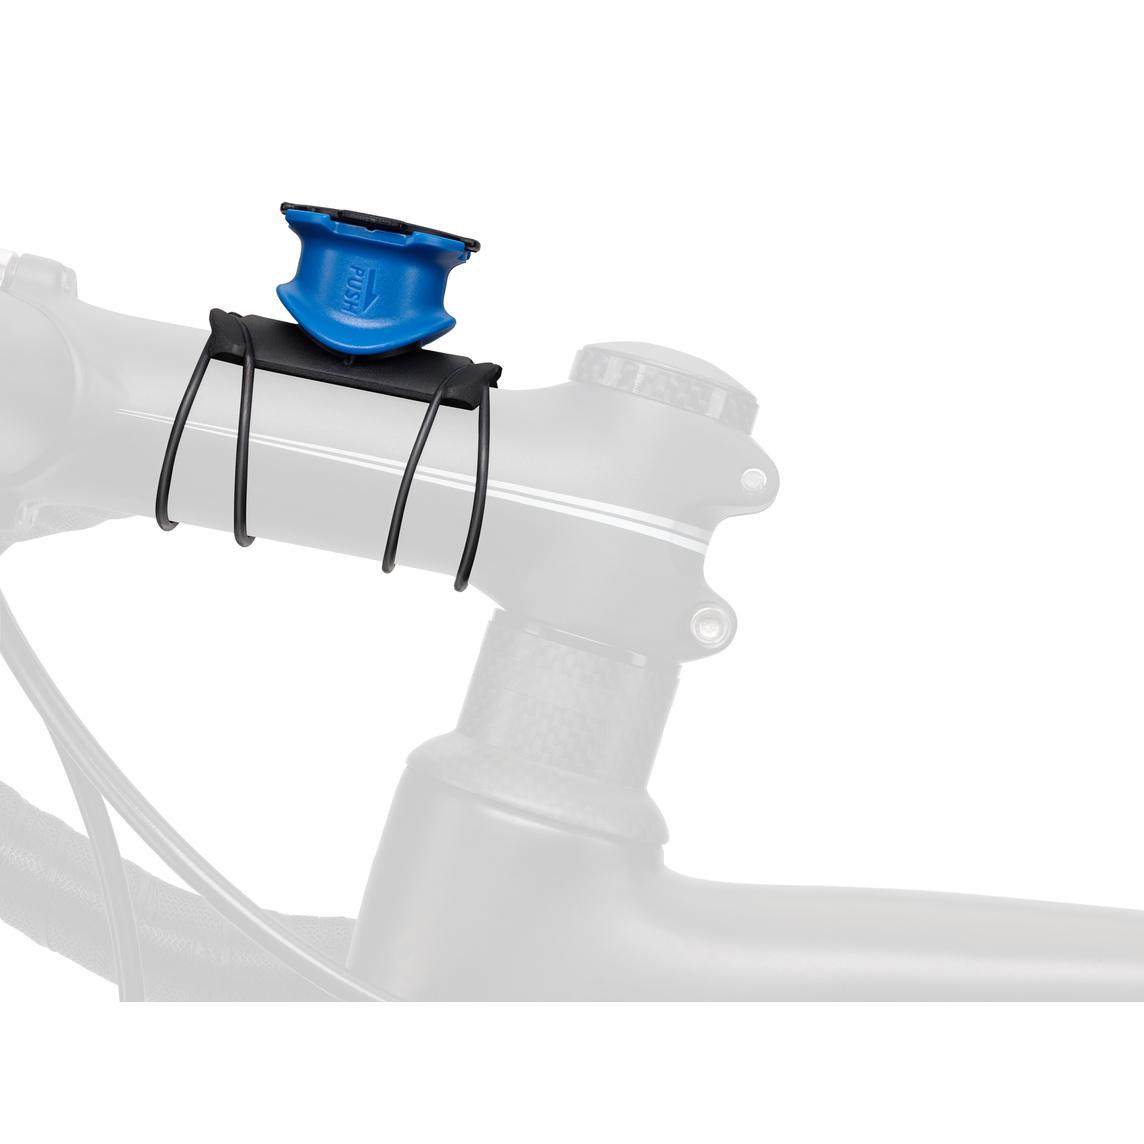 sale retailer 84c18 ac952 Quad Lock Bike Mount Kit for iPhone XS Max